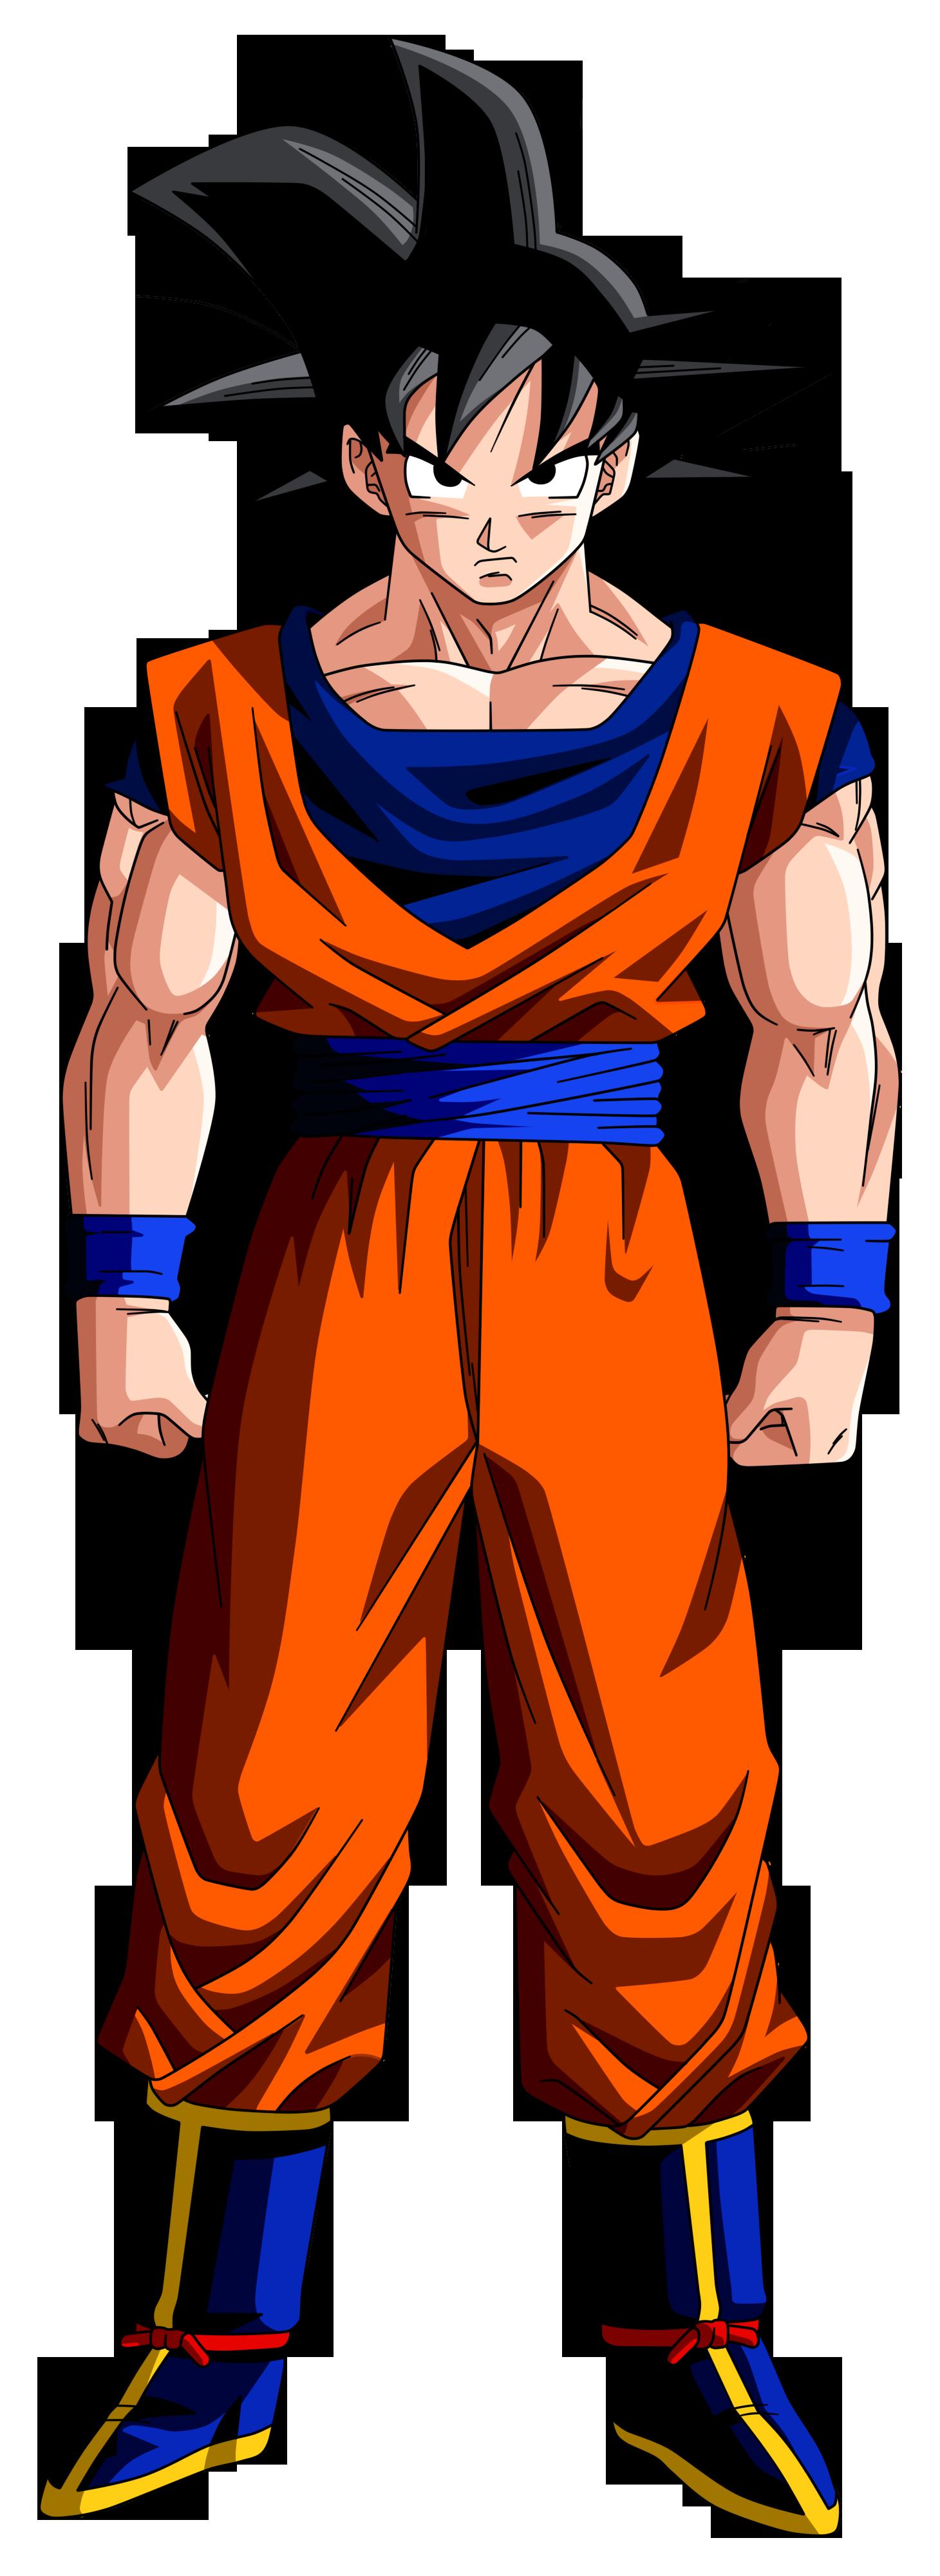 Image - Goku Dragon Ball Z.png | Sonja's Adventure Series ...